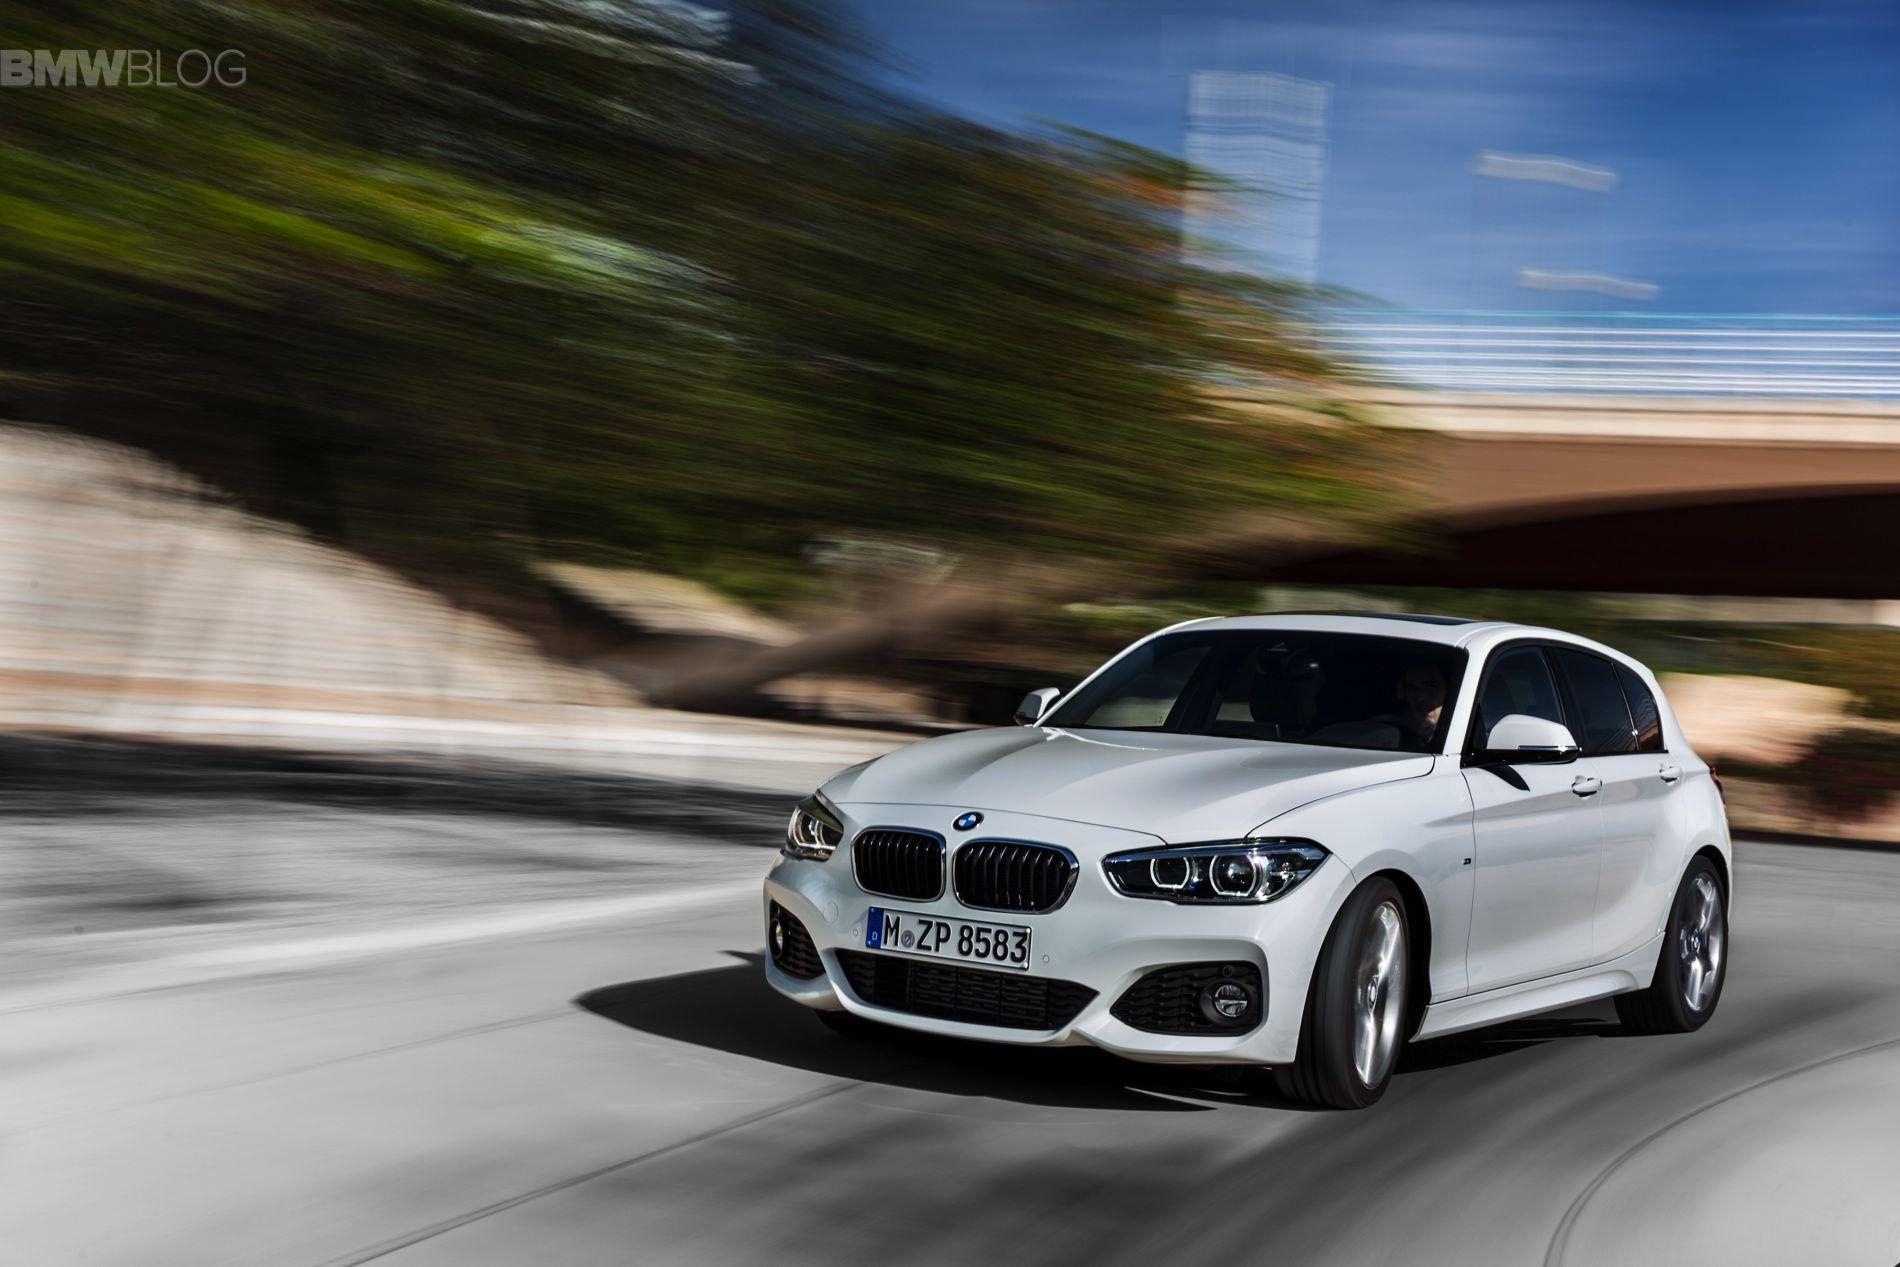 2015 bmw 1 series m sport images 11 750x500 2015 BMW 1 Series ...